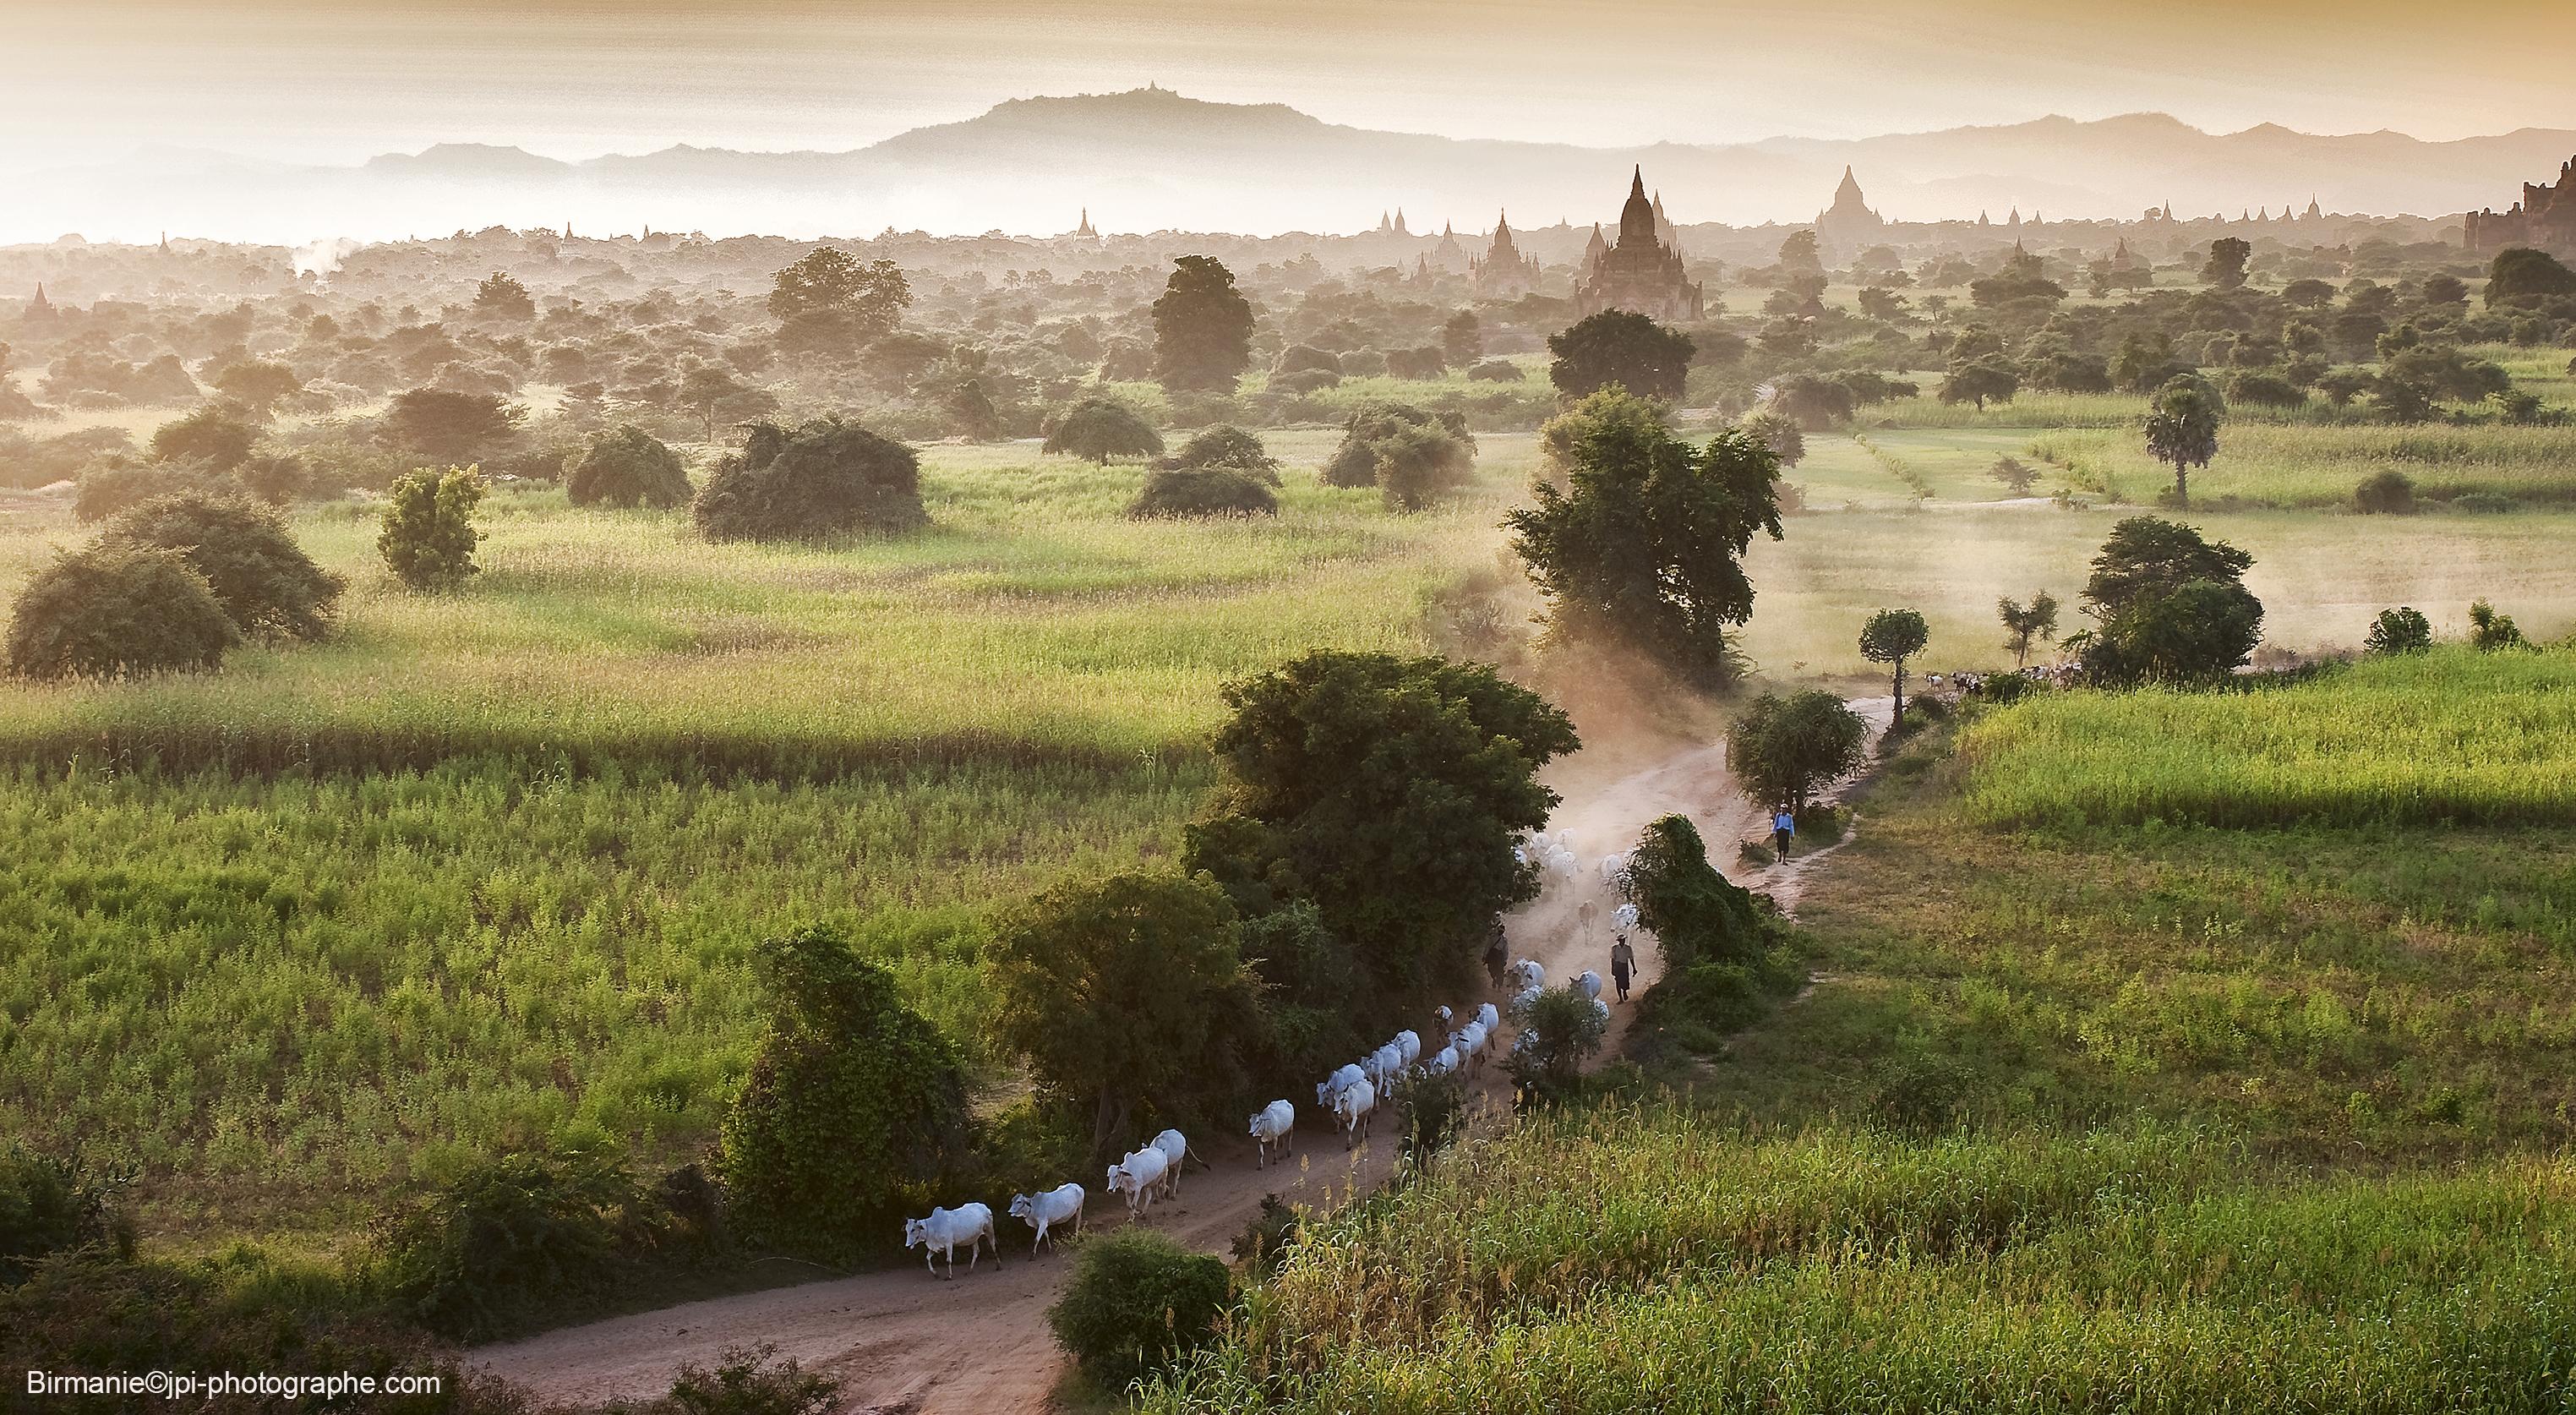 Myanmar Birmanie photo paysage Bagan